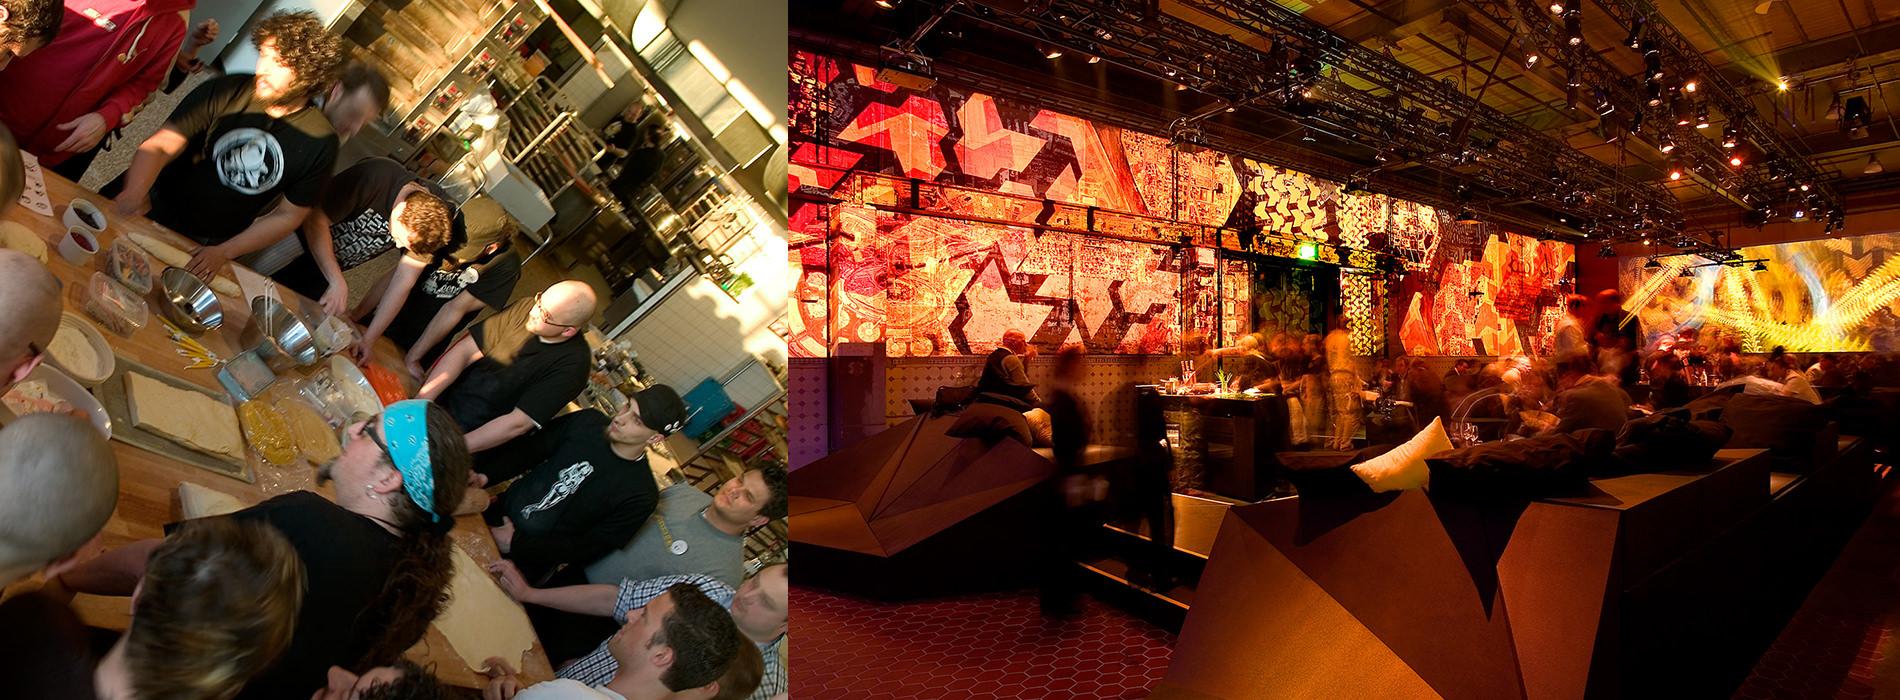 Messe Design Live Kommunikation Kopenhagen VW Projekt Fox Hotel Club Bar Restaurant Gäste Going Places EventLabs